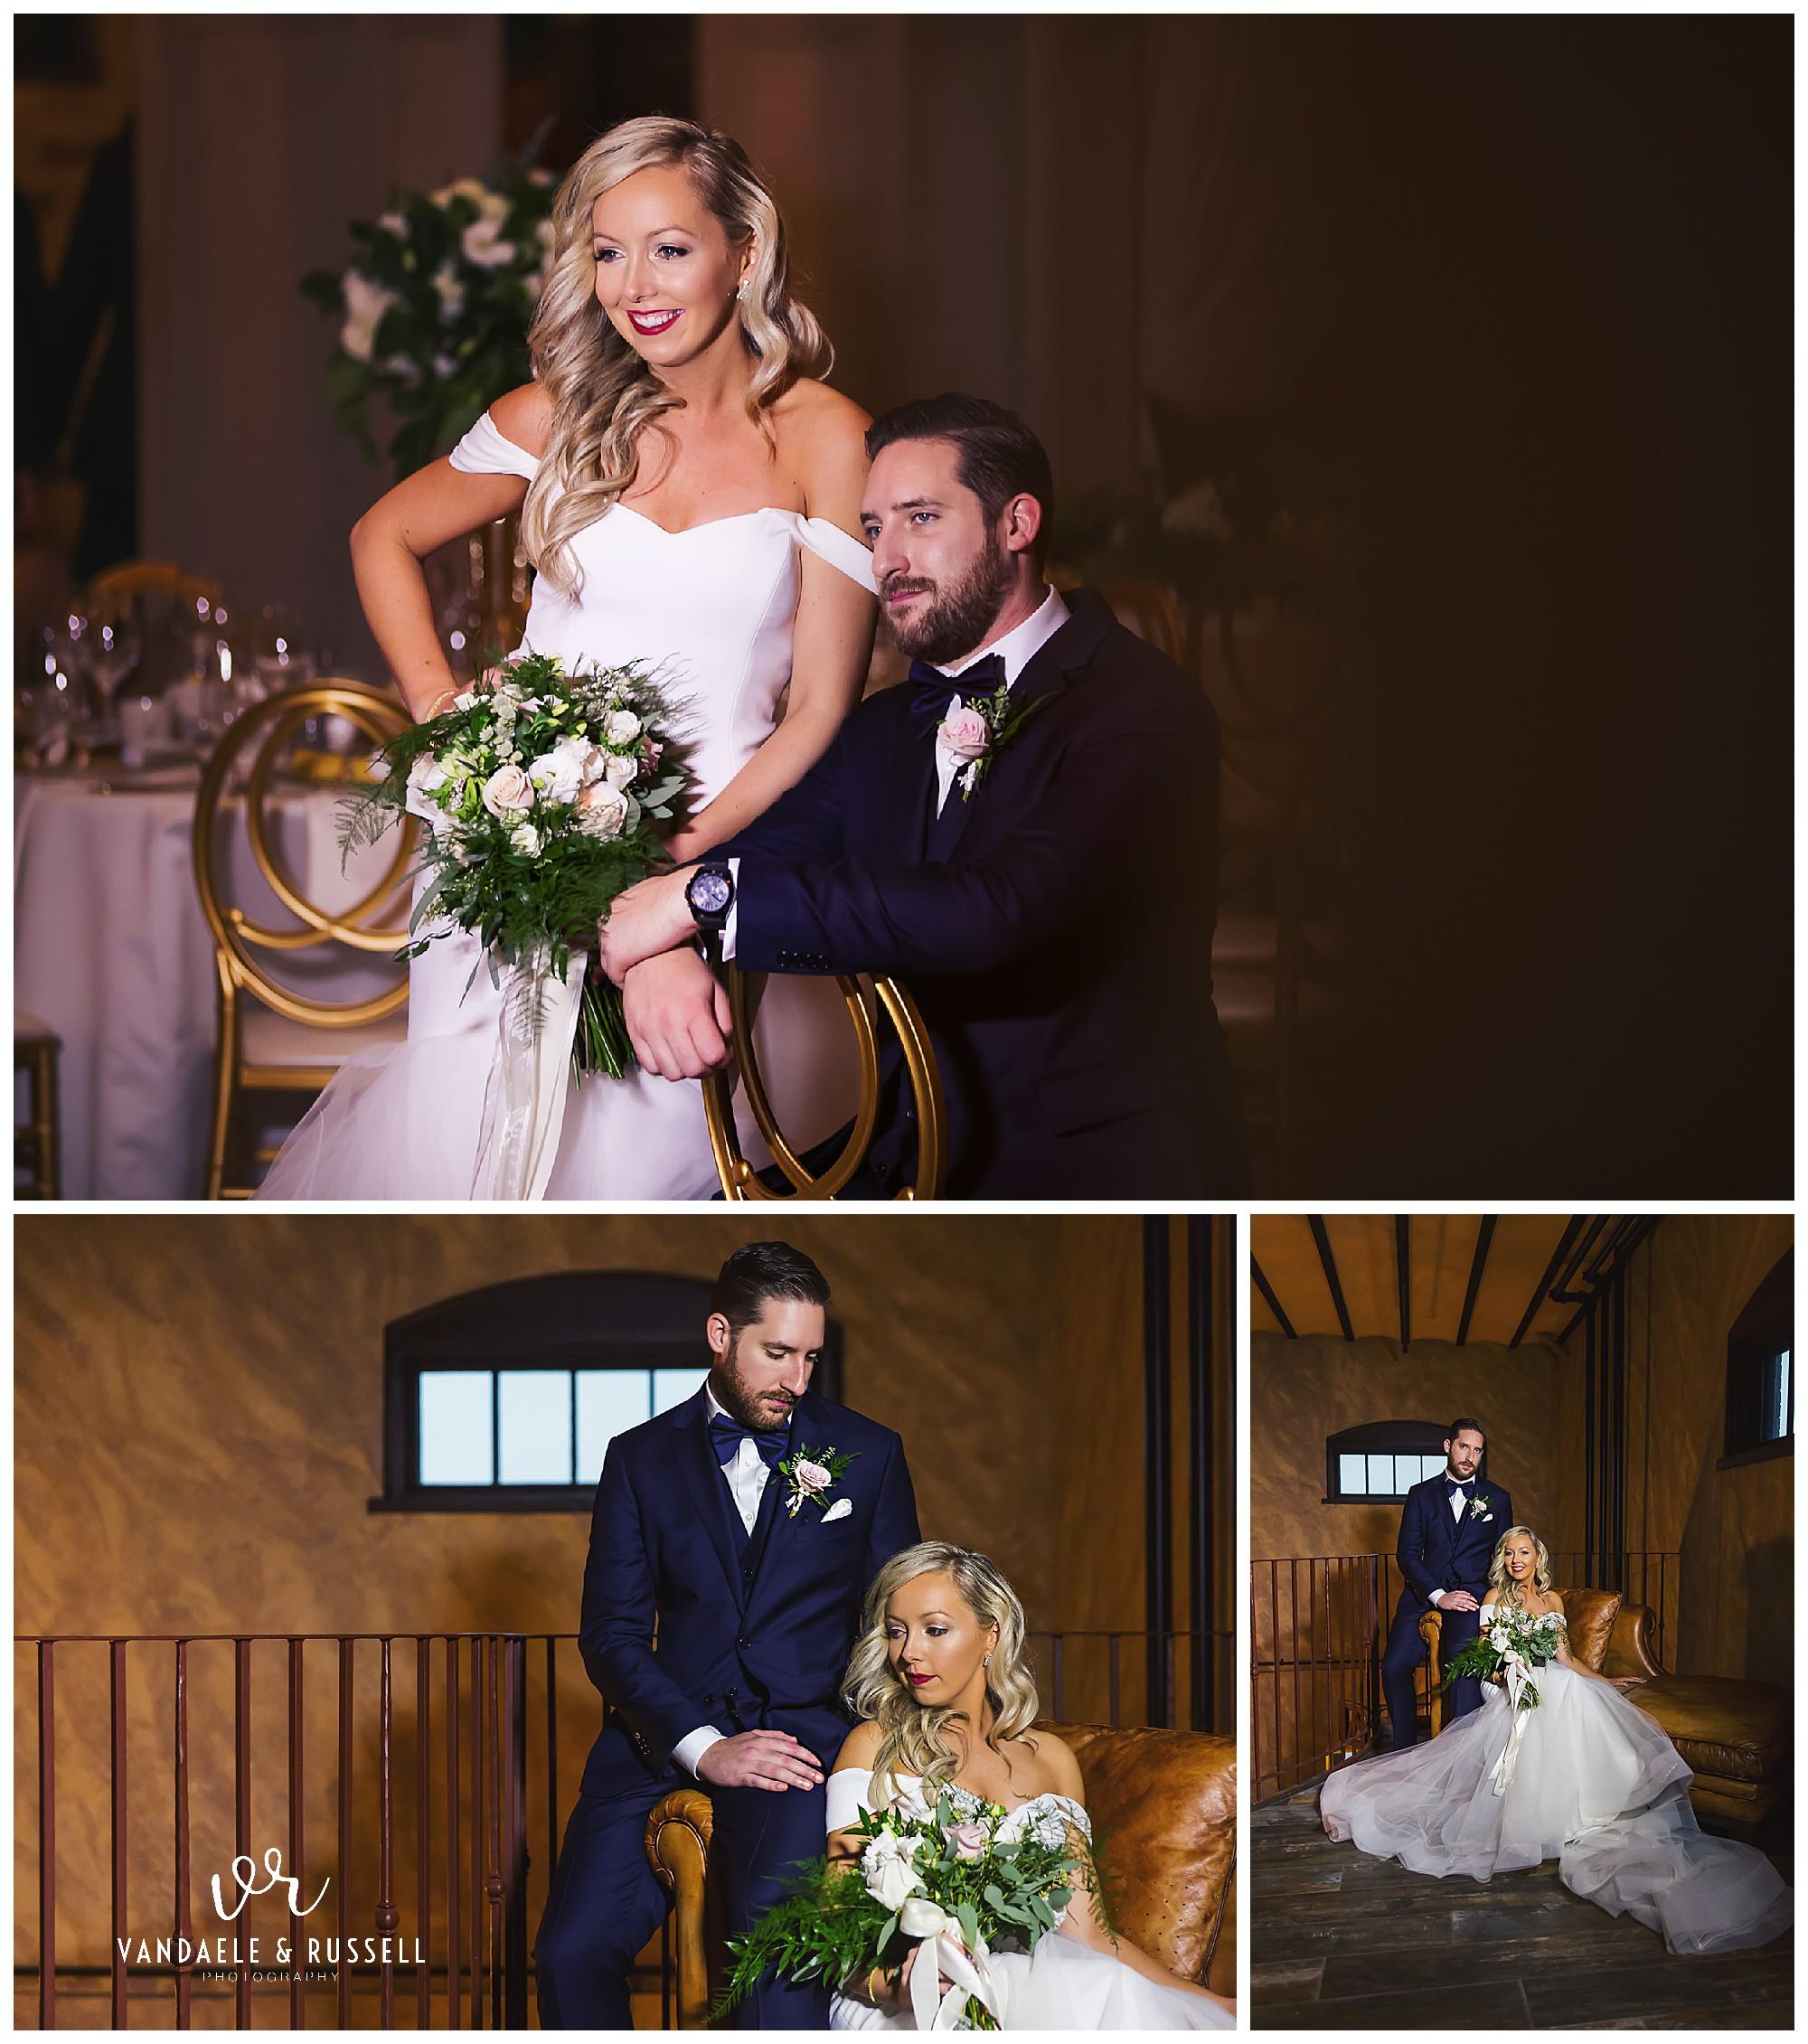 Hacienda-Sarria-Wedding-Photos-NYE-Michelle-Matt-VanDaele-Russell_0029.jpg